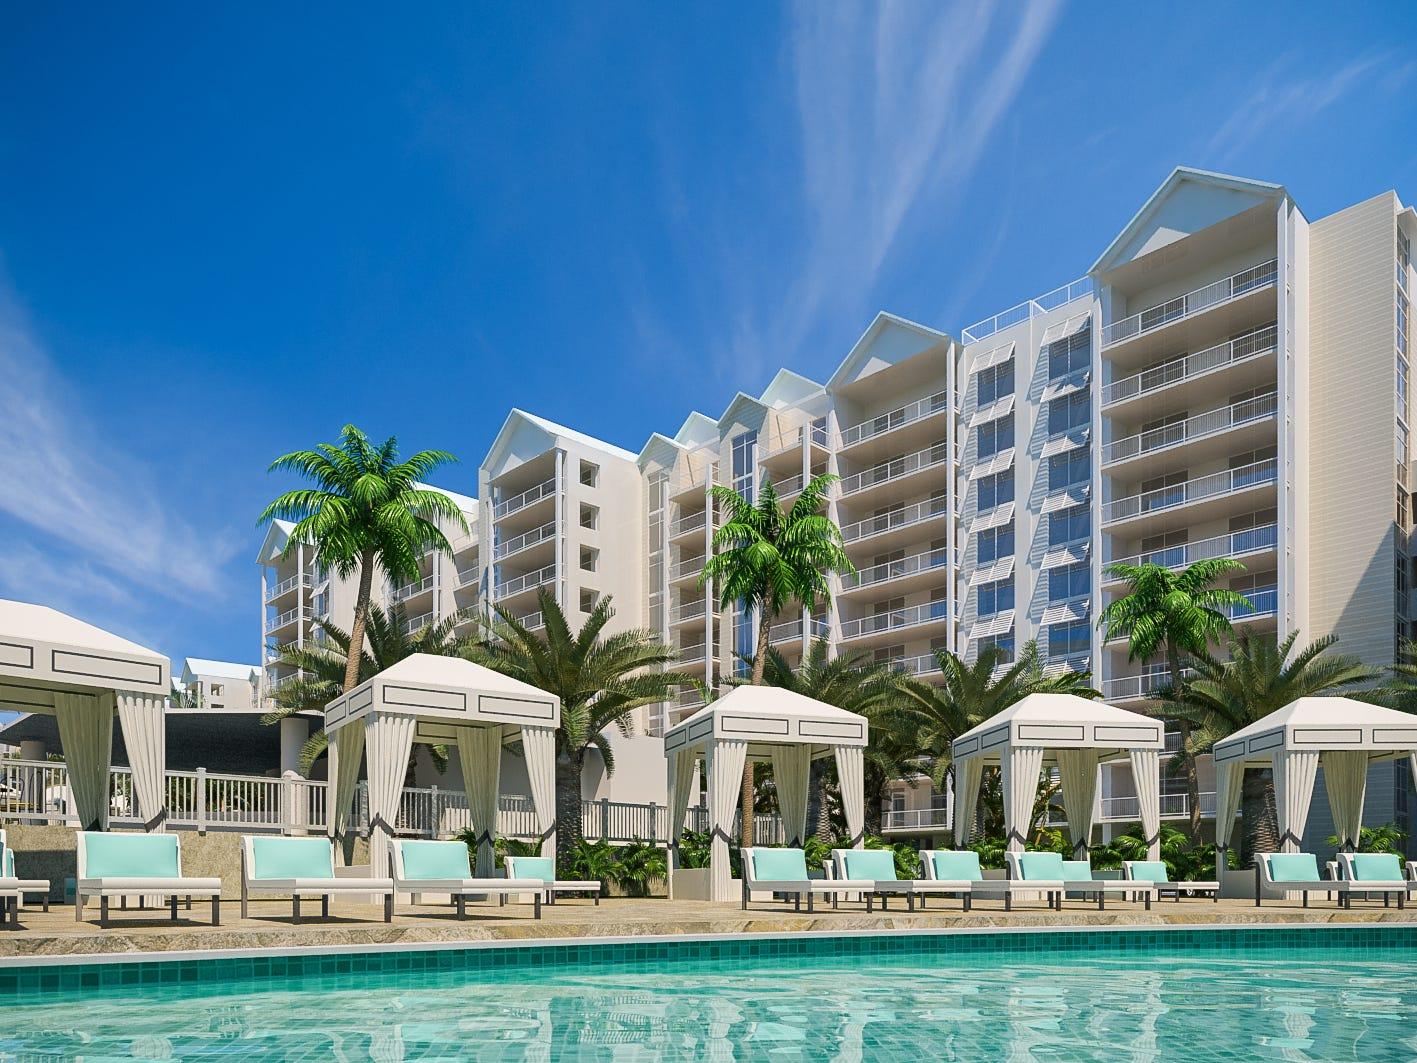 Design rendering of Allegiant Air's planned Sunseeker Resort Charlotte Harbor in Southwest Florida.